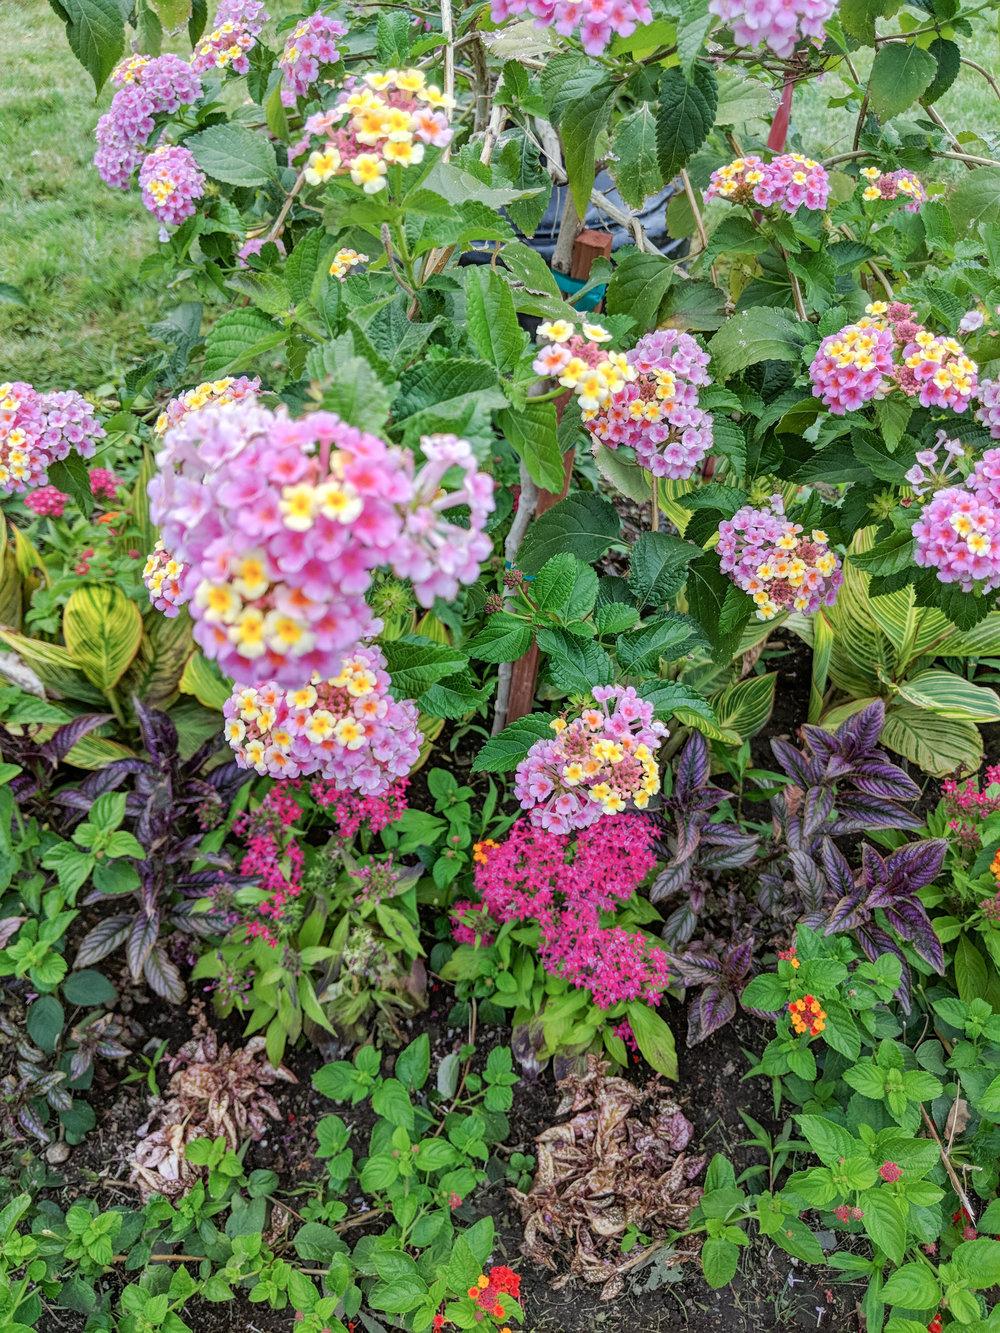 bri rinehart; flowers; photography; boston common